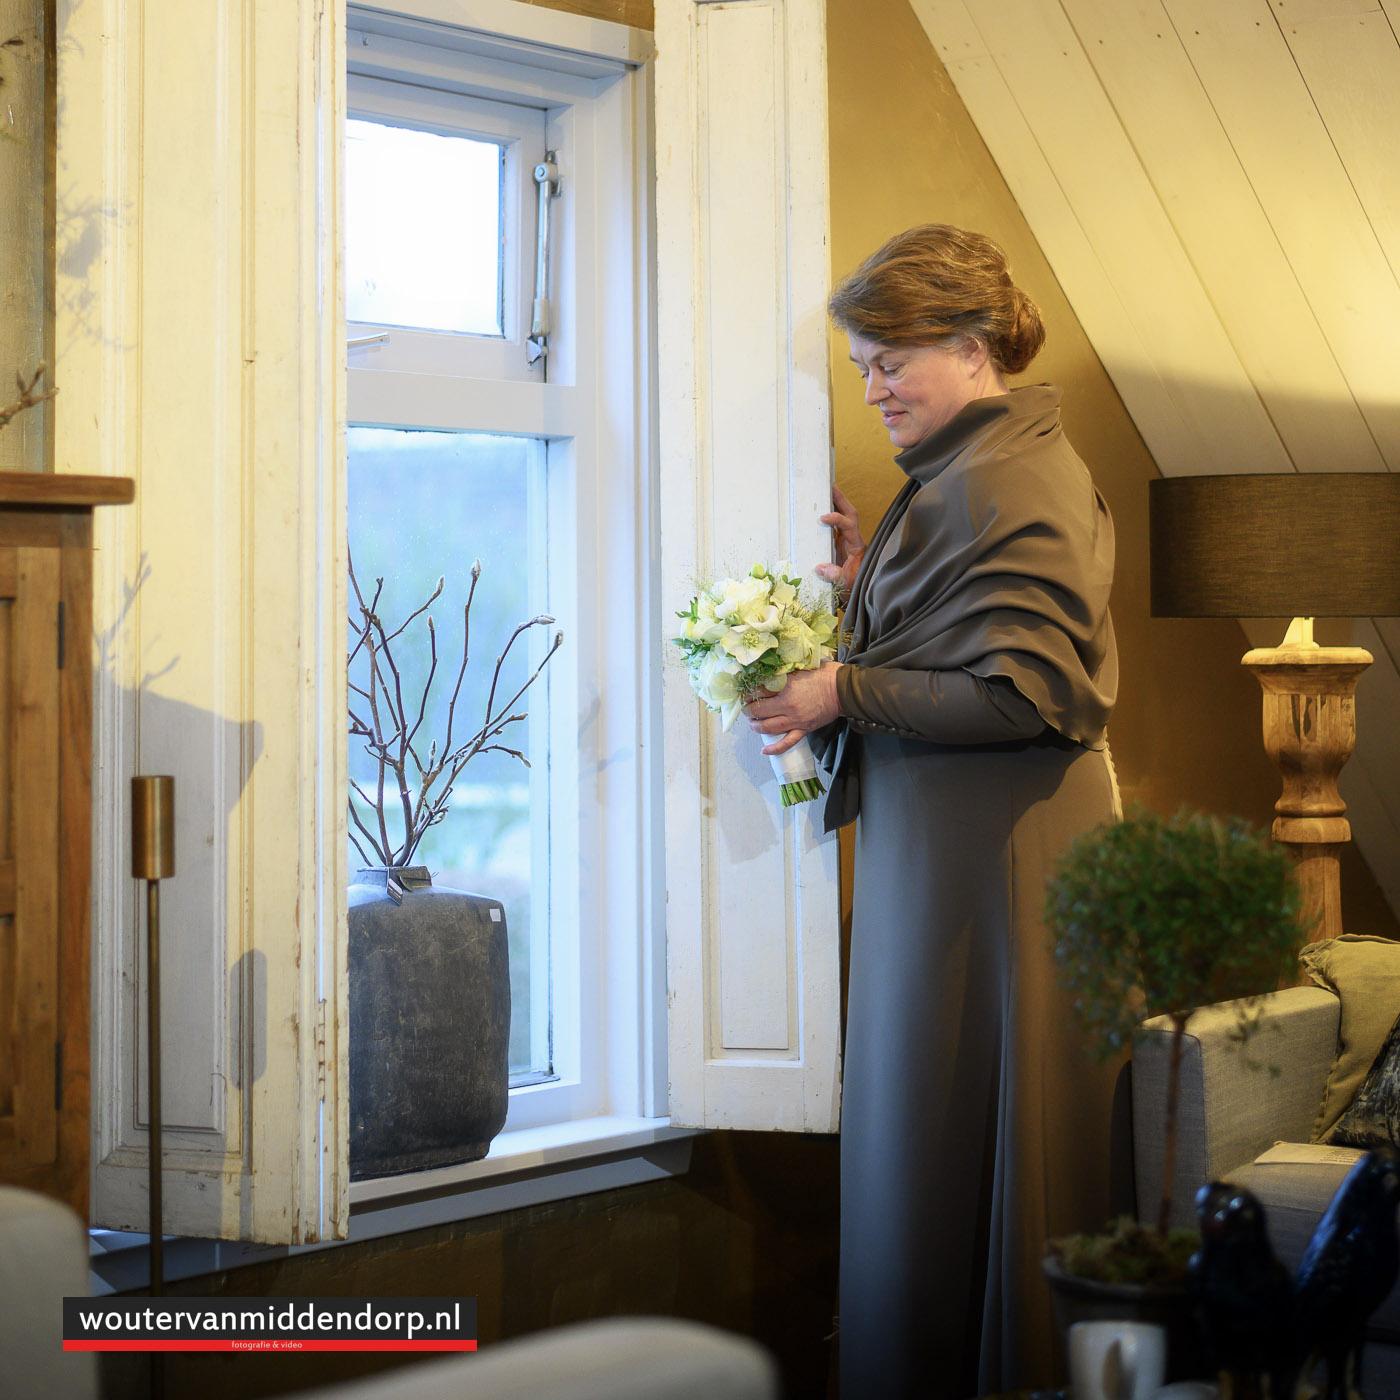 bruidsfotografie Wouter van Middendorp Uddel Elspeet Barneveld, omgeving trouwfotograaf-17